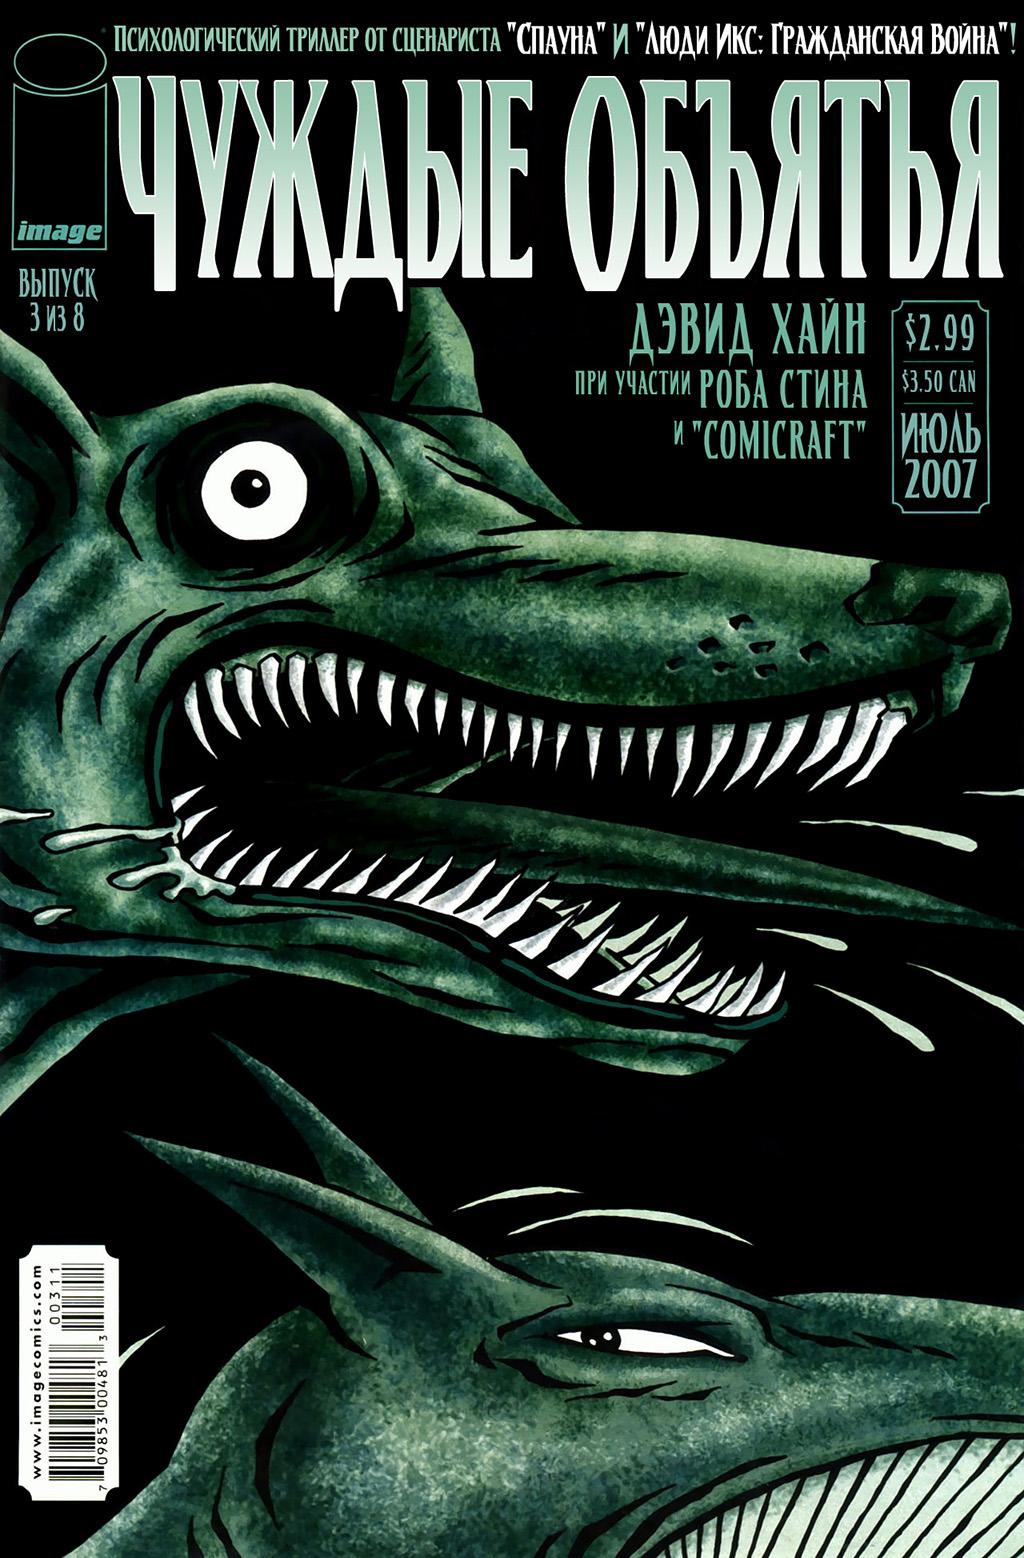 Комикс Чуждые Объятья